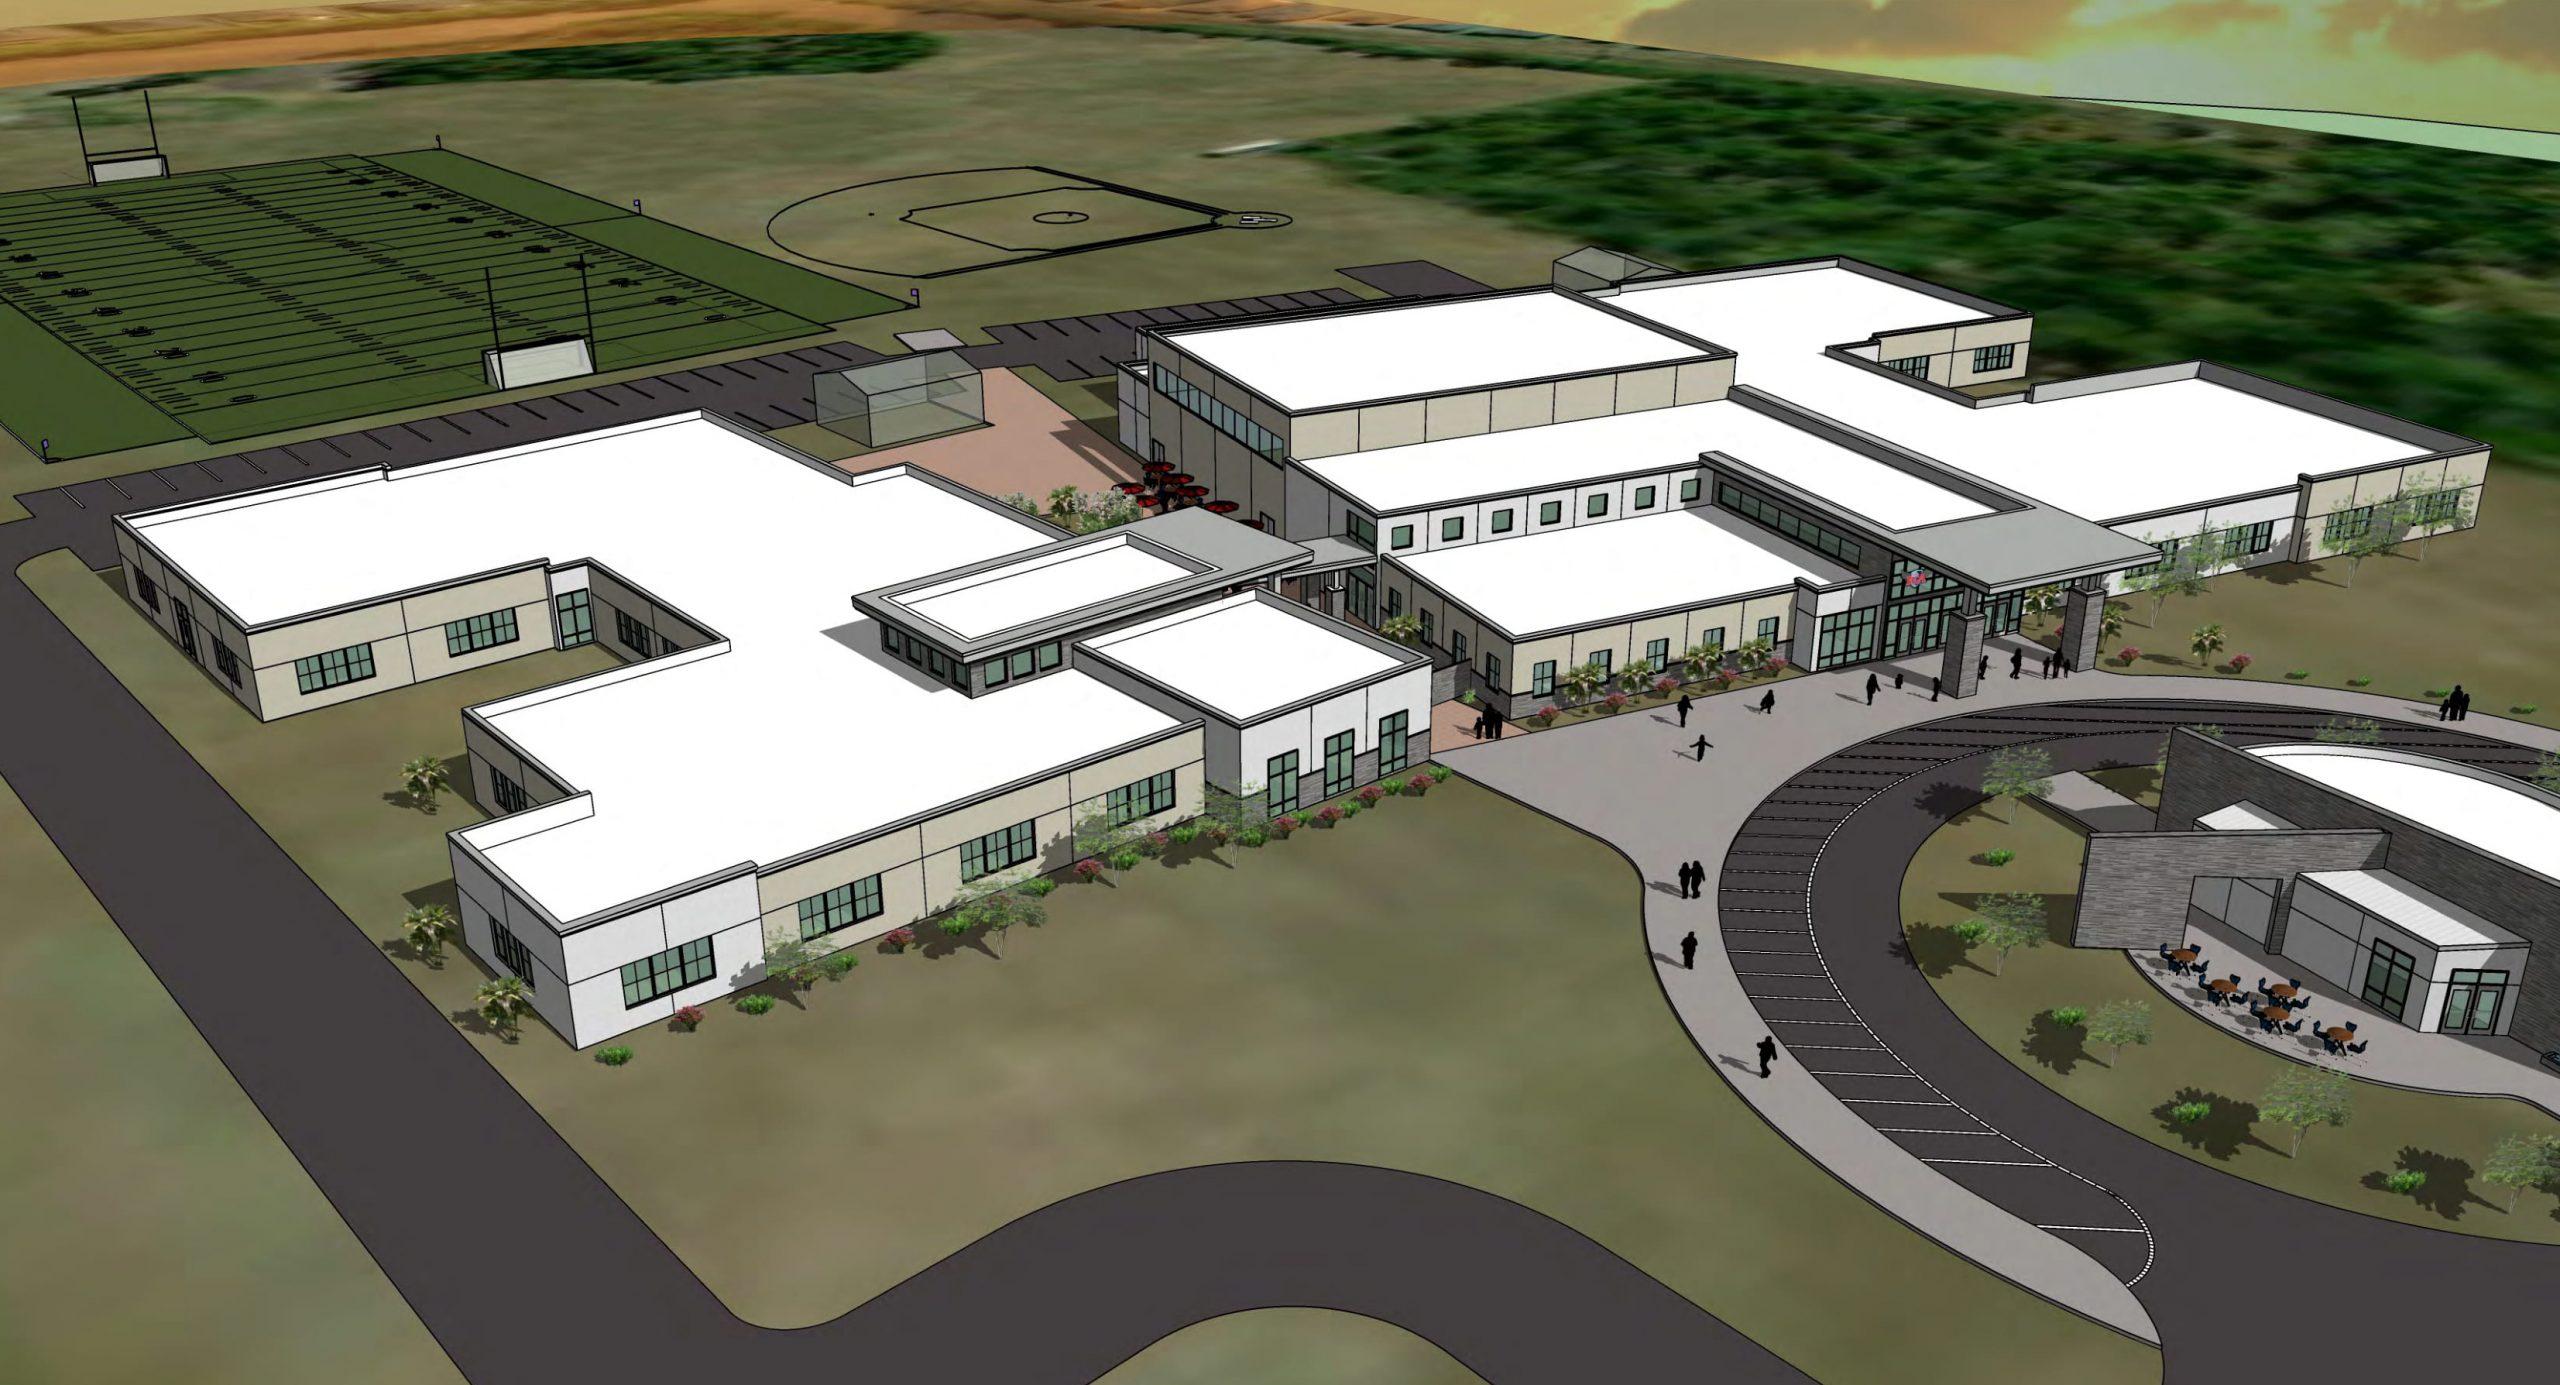 New School Campus Layout